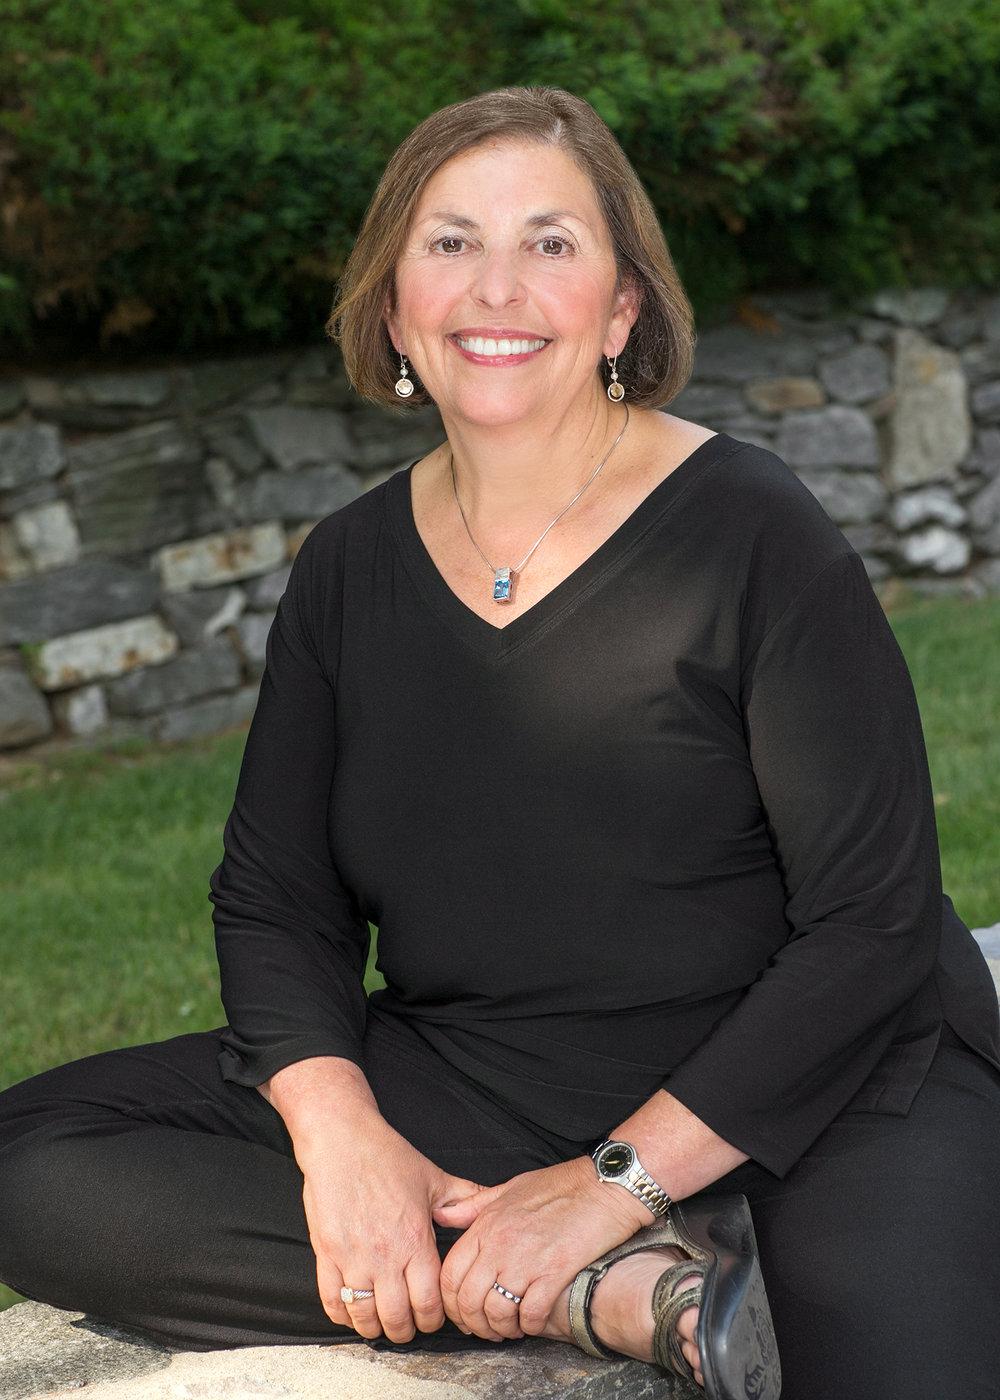 Helen Tager-Flusberg